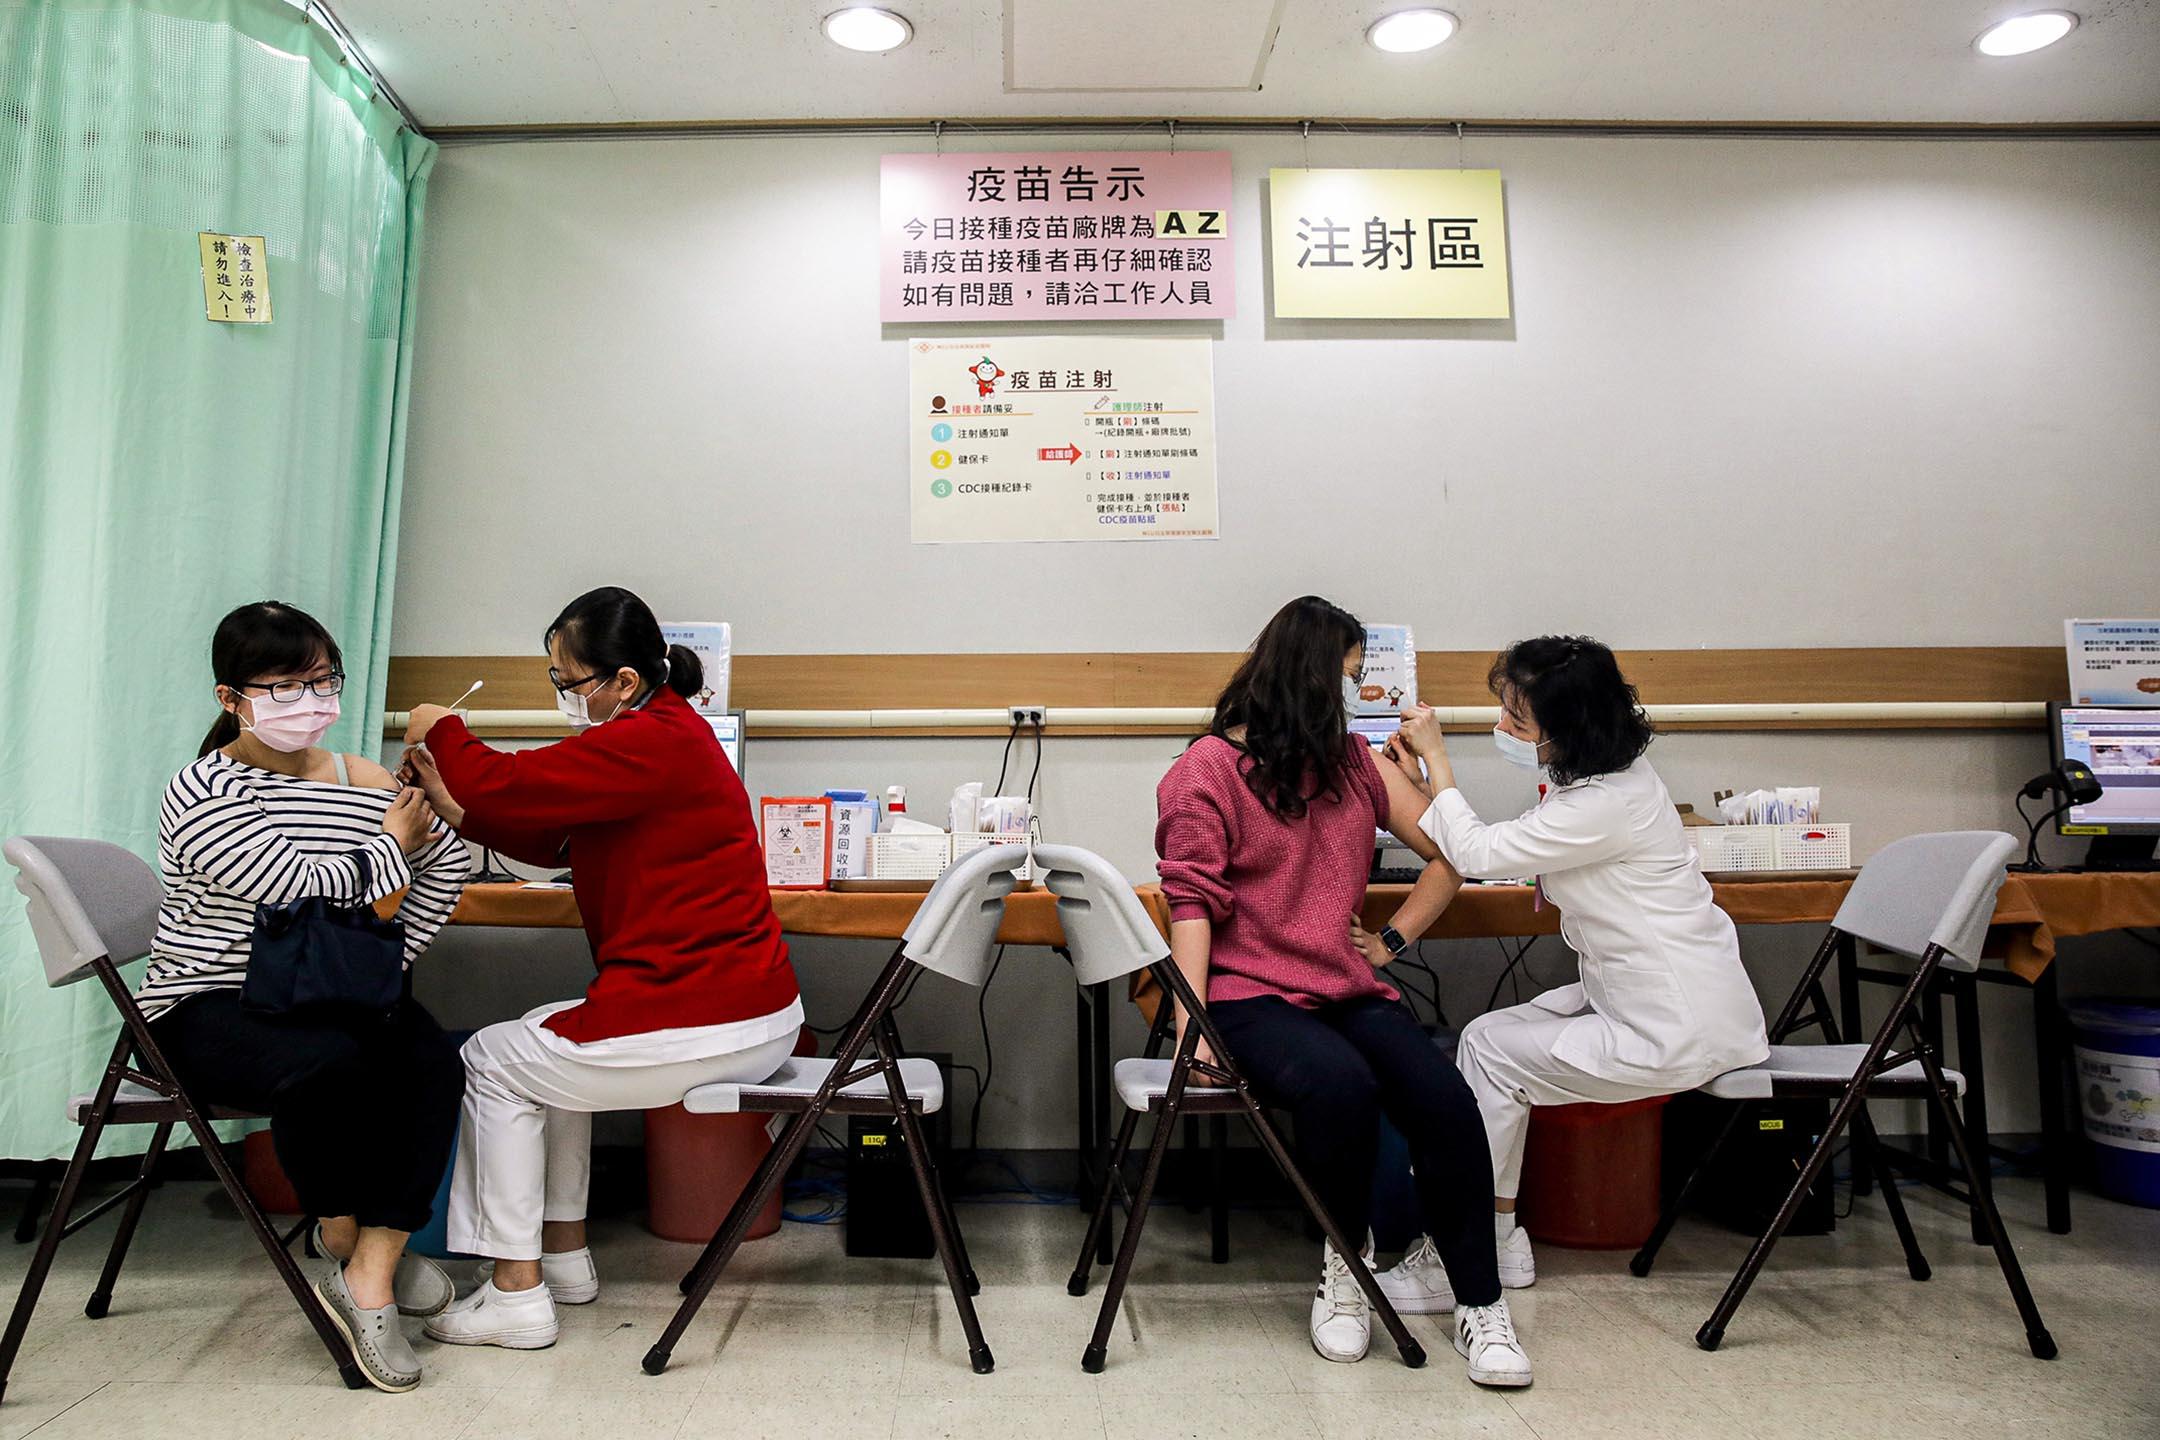 2021年3月22日台北,醫護人員在醫院接種疫苗。 攝:I-Hwa Cheng/Bloomberg via Getty Images